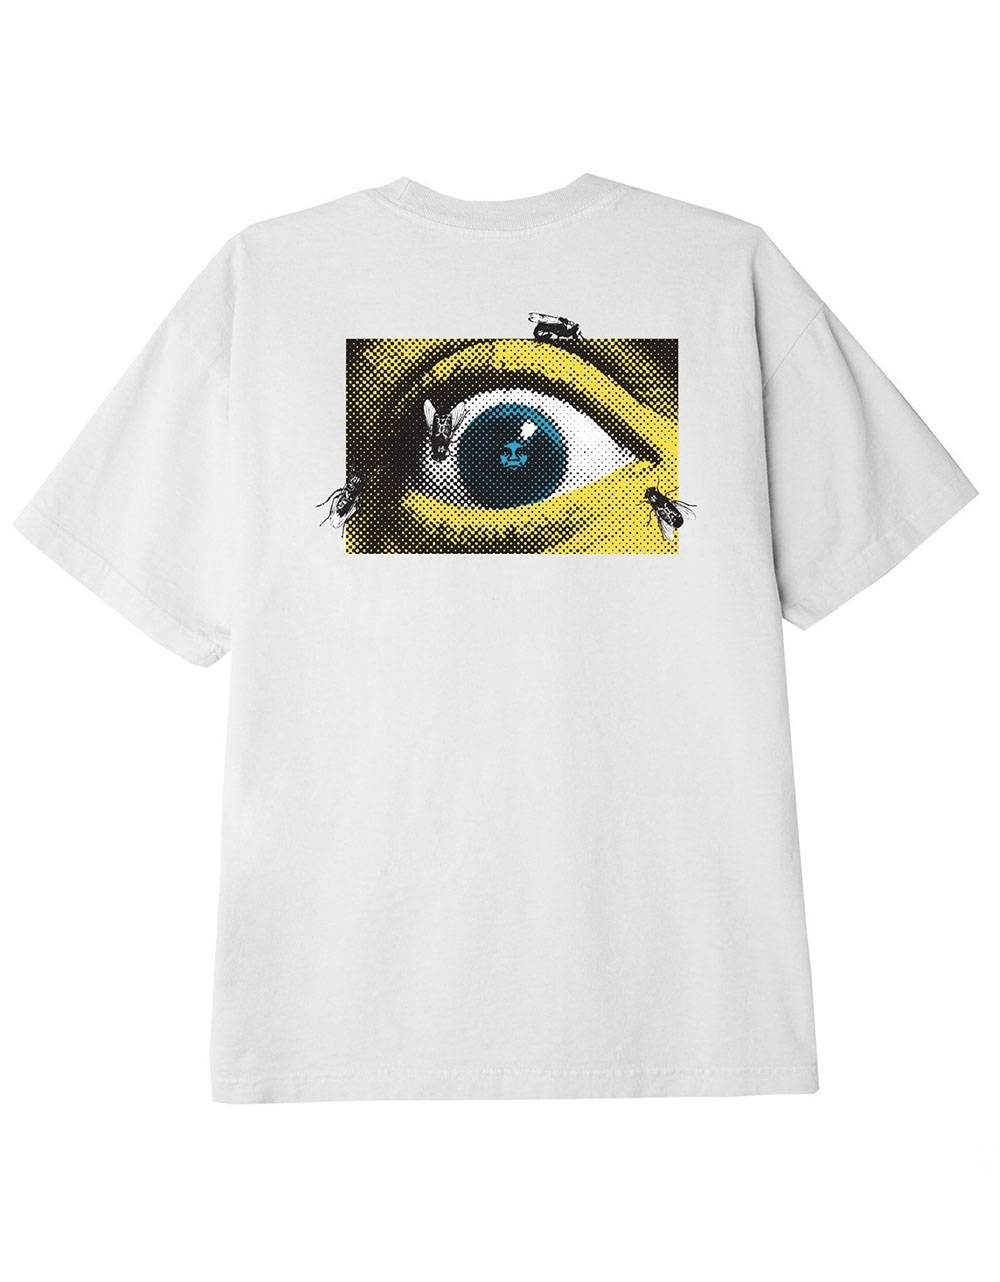 Obey mass seduction classic t-shirt - white obey T-shirt 36,89€